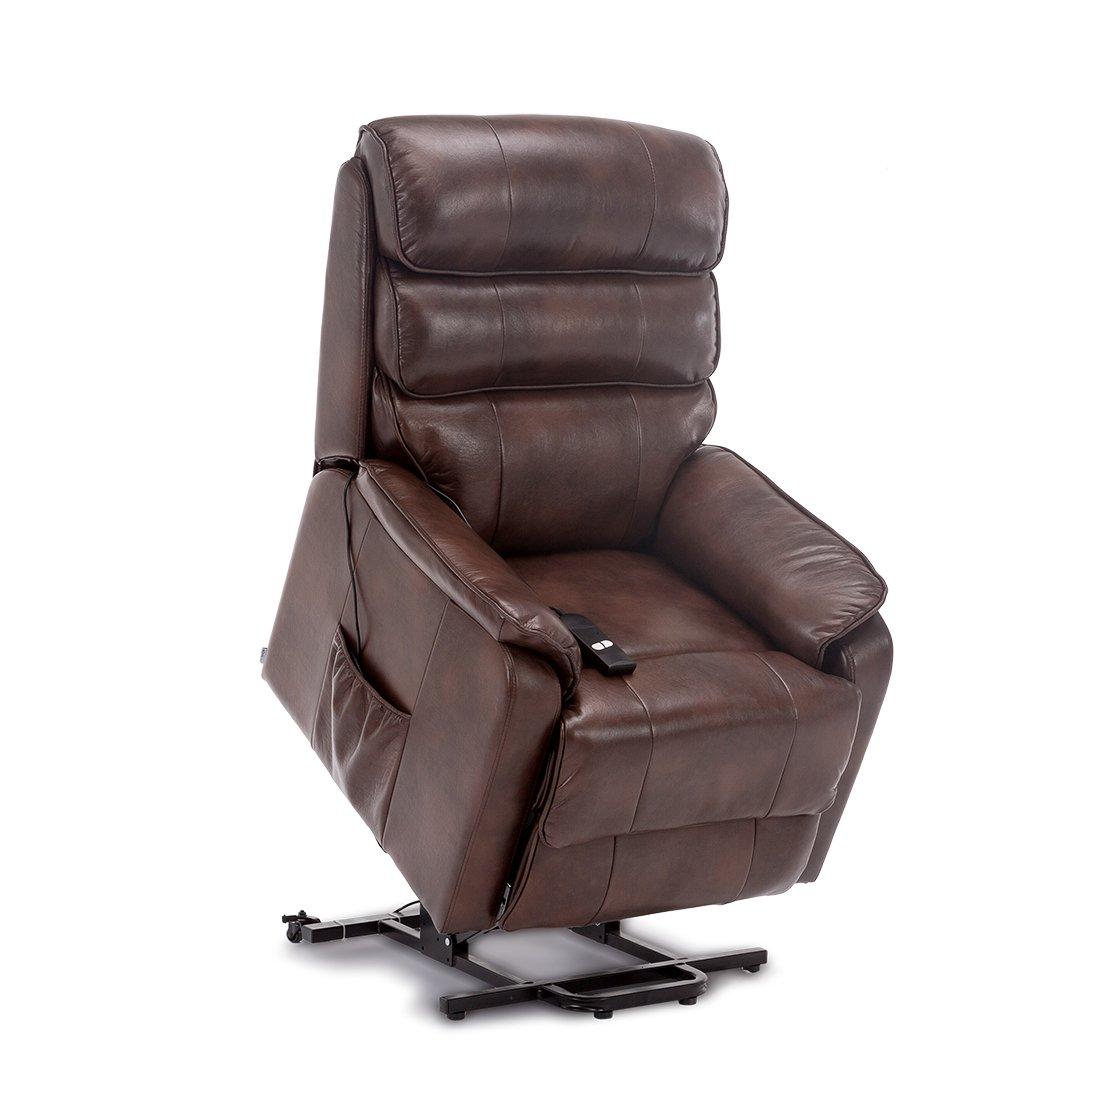 Pleasant More4Homes Buckingham Elecrtic Rise Recliner Leather Air Creativecarmelina Interior Chair Design Creativecarmelinacom